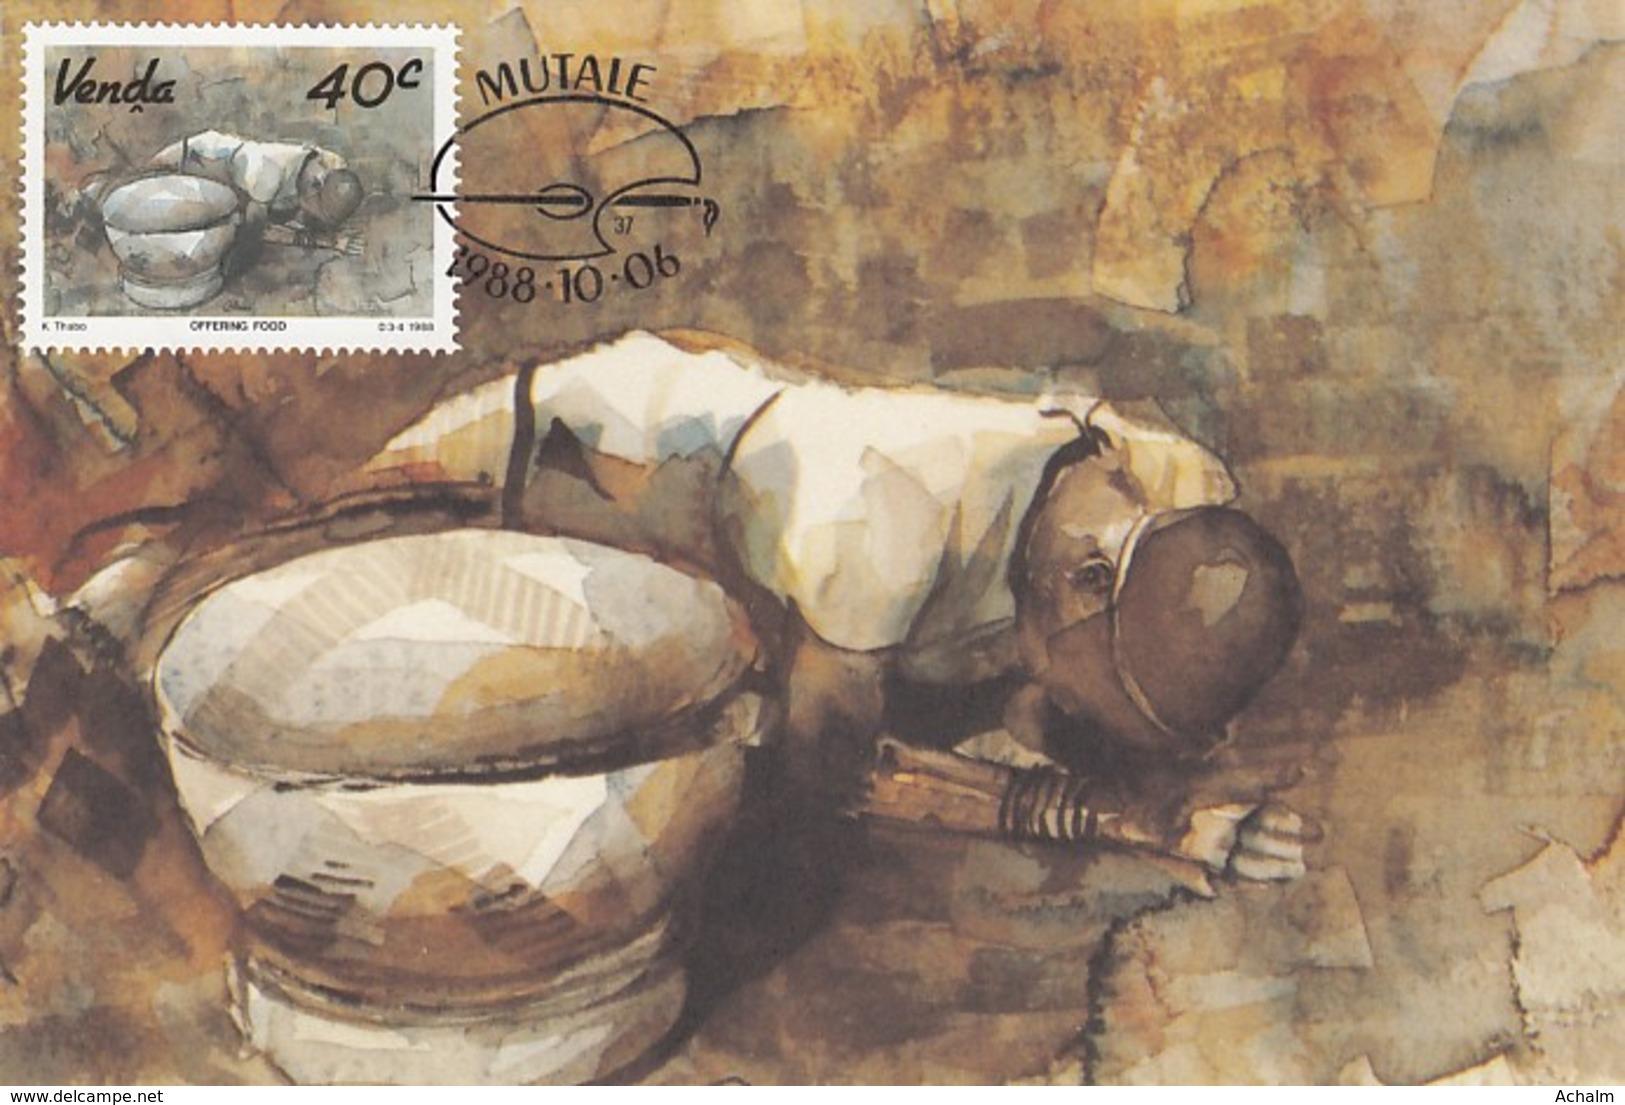 Venda - Maximum Card Of 1988 - MiNr. 181 - Local Art - Offering Food - Venda